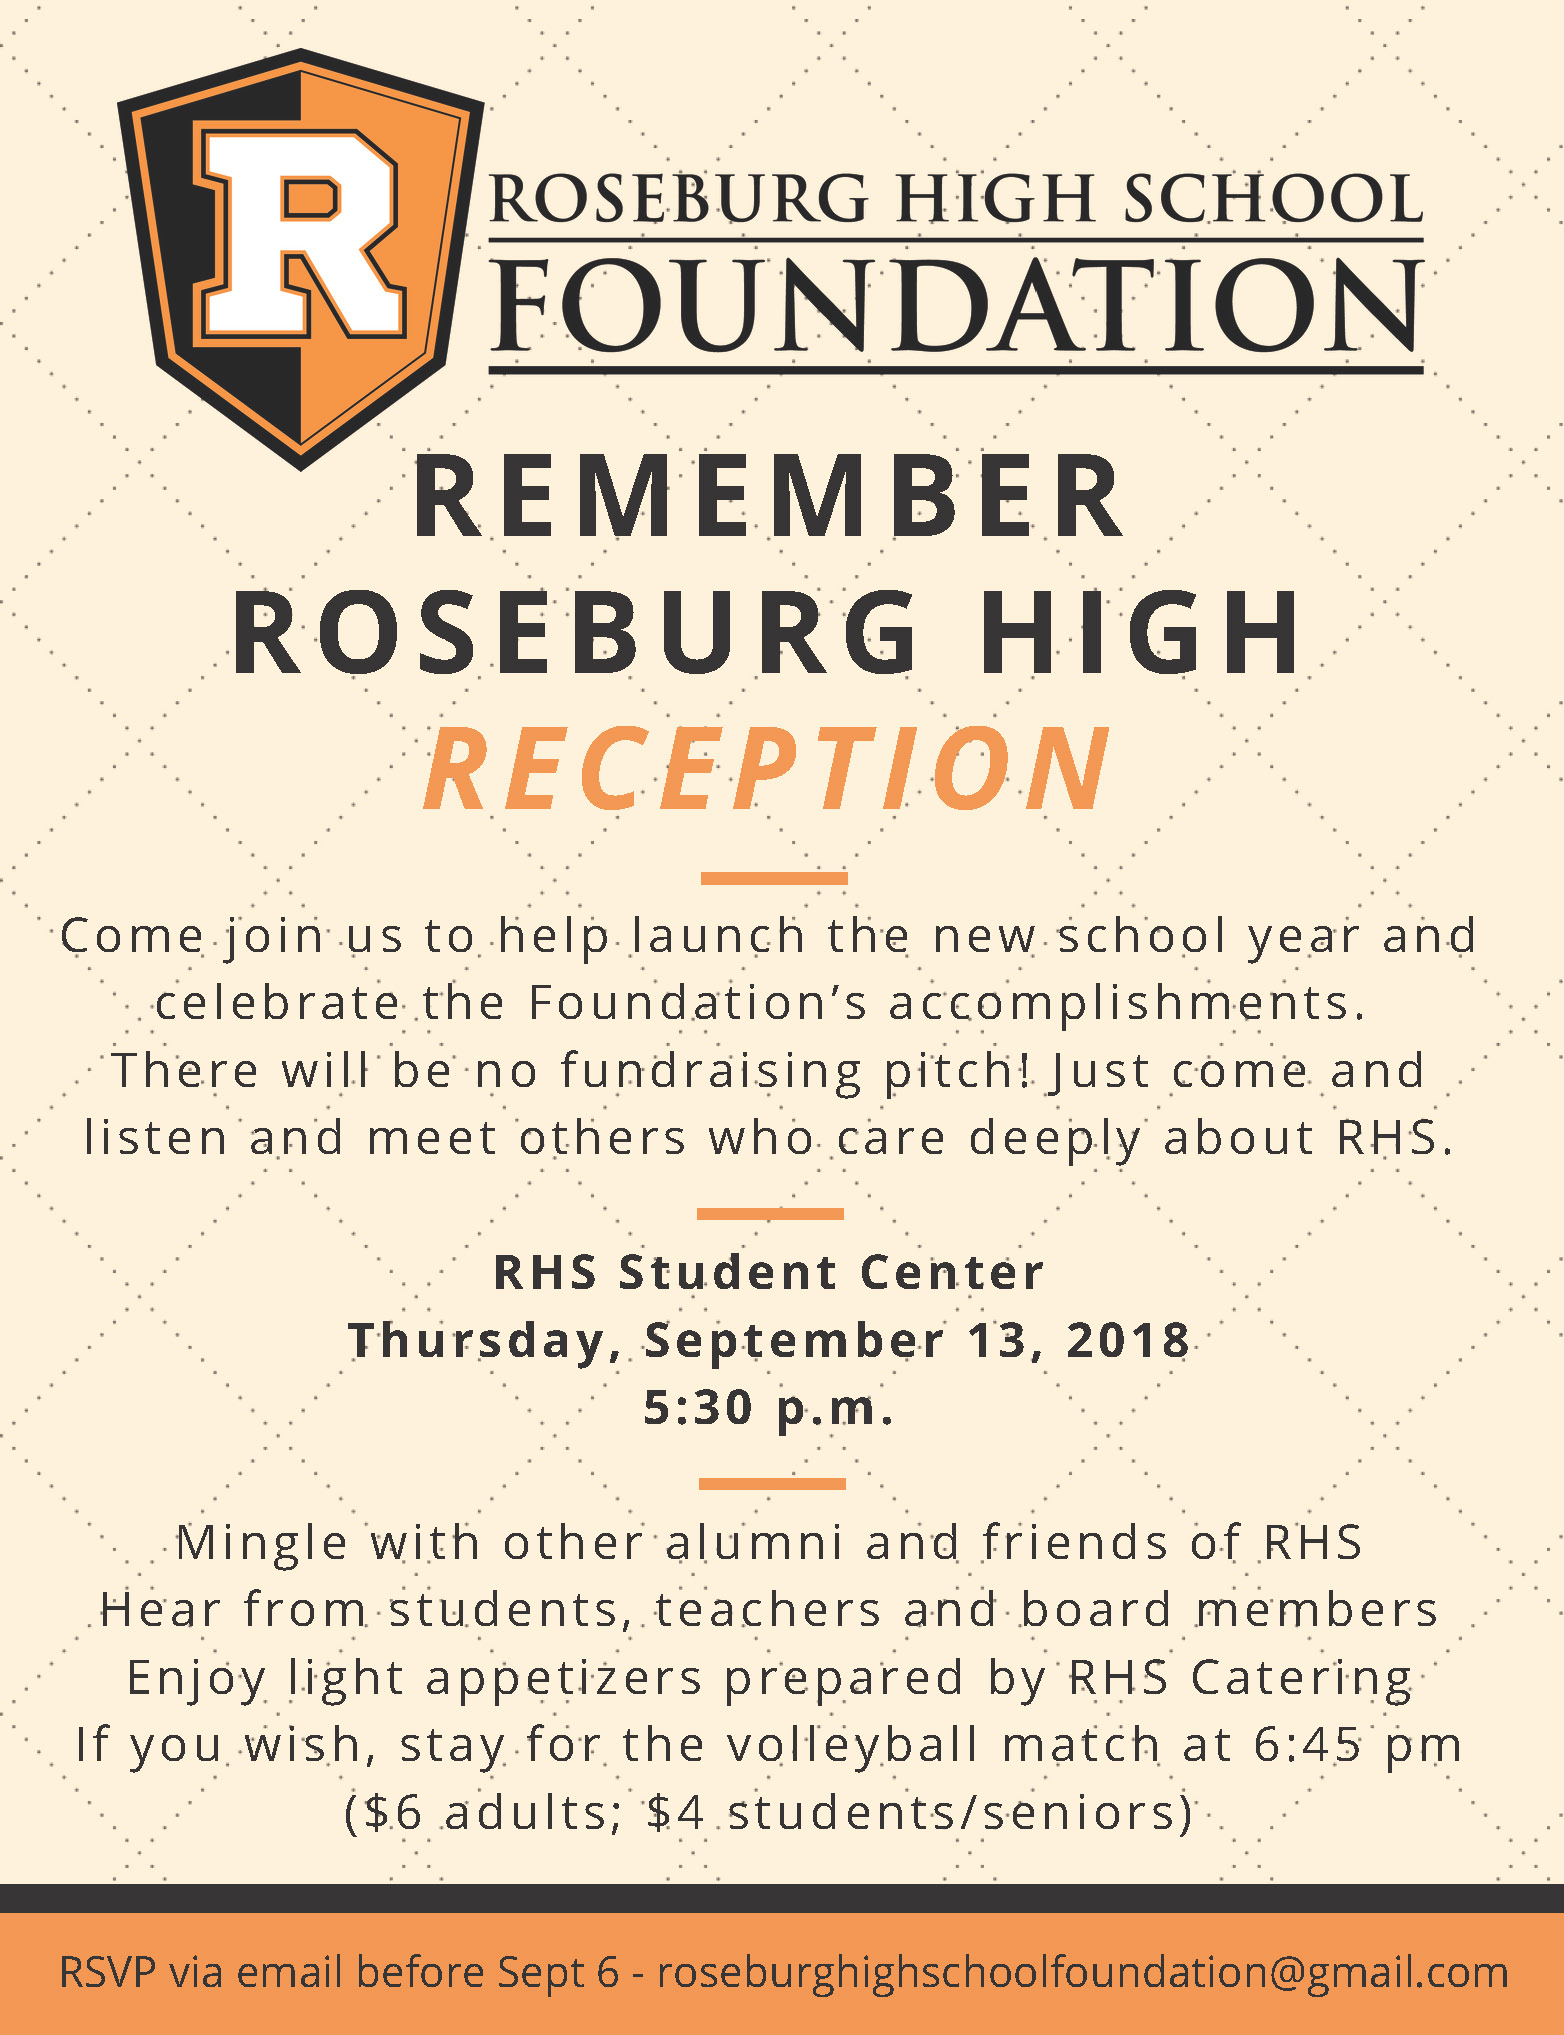 RHS Foundation Kickoff Reception